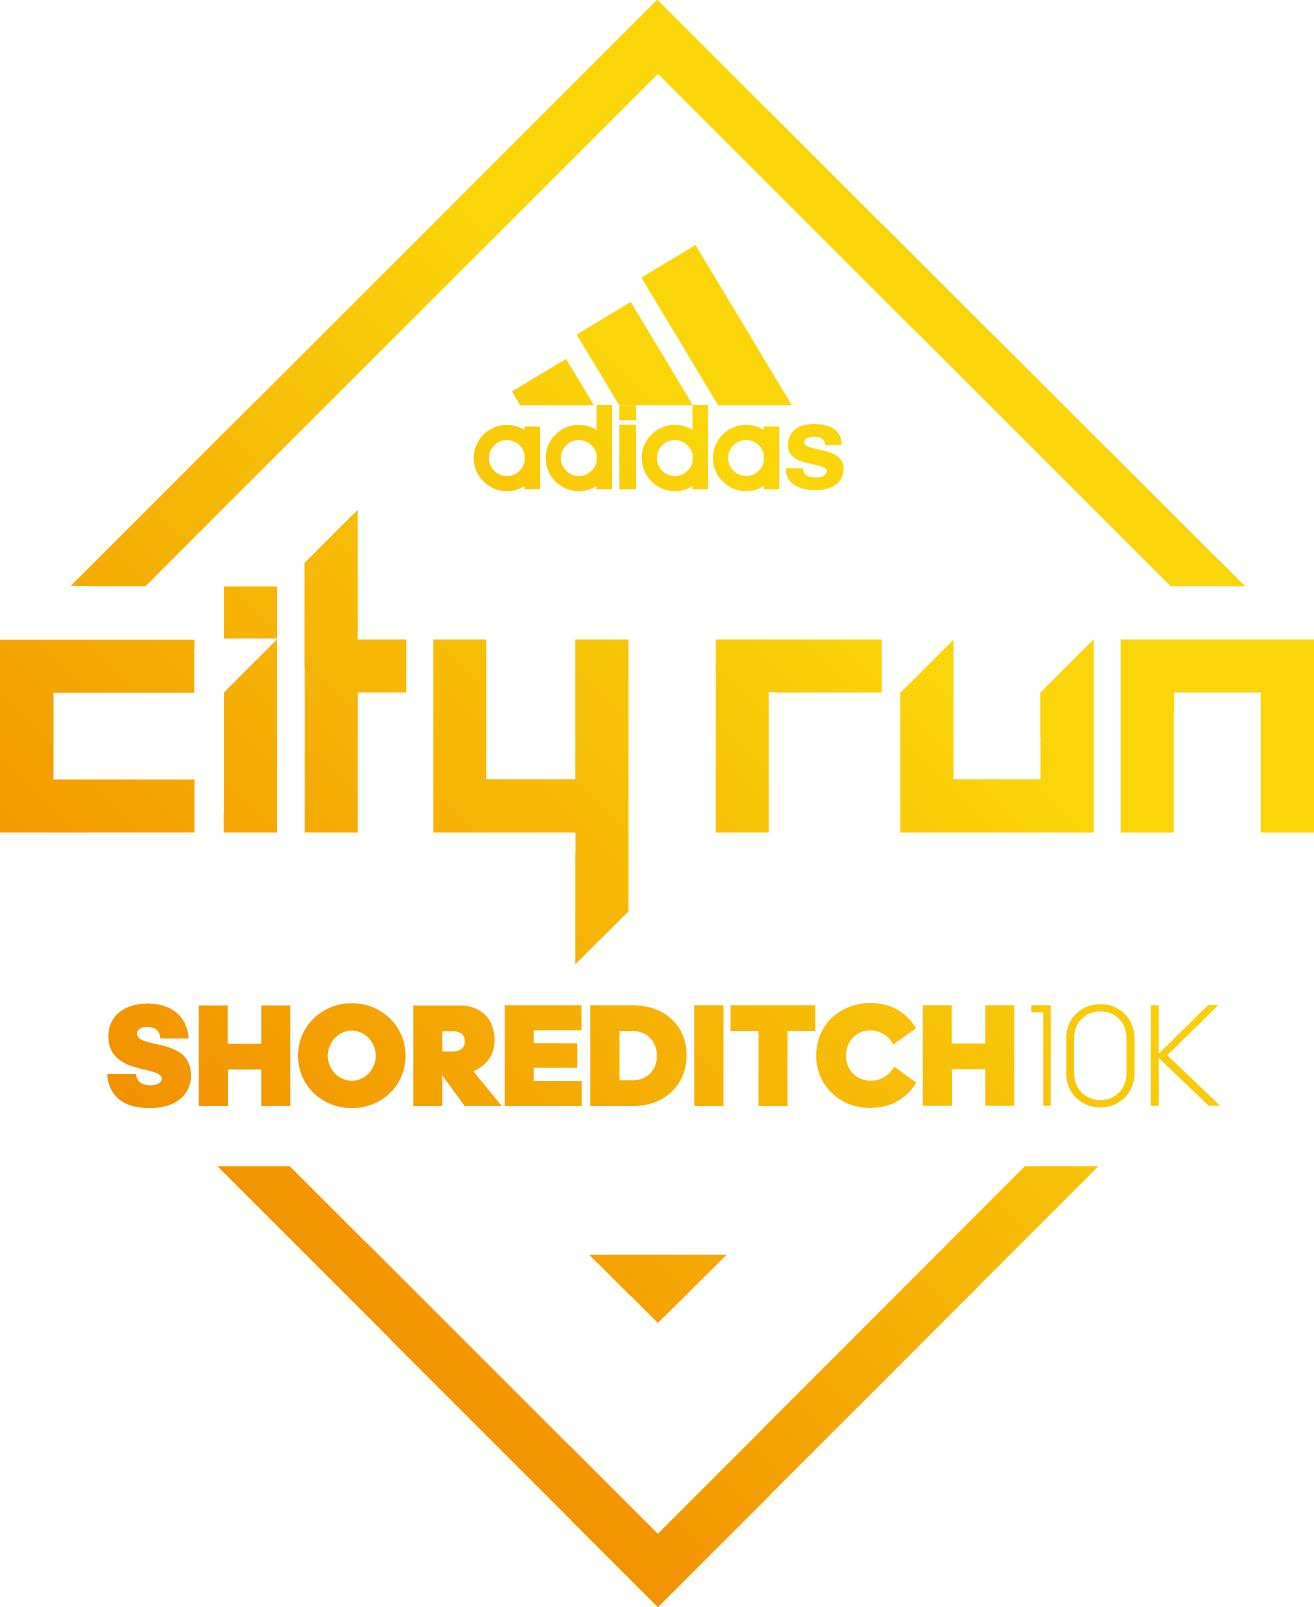 adidas City Run: Shoreditch 10K